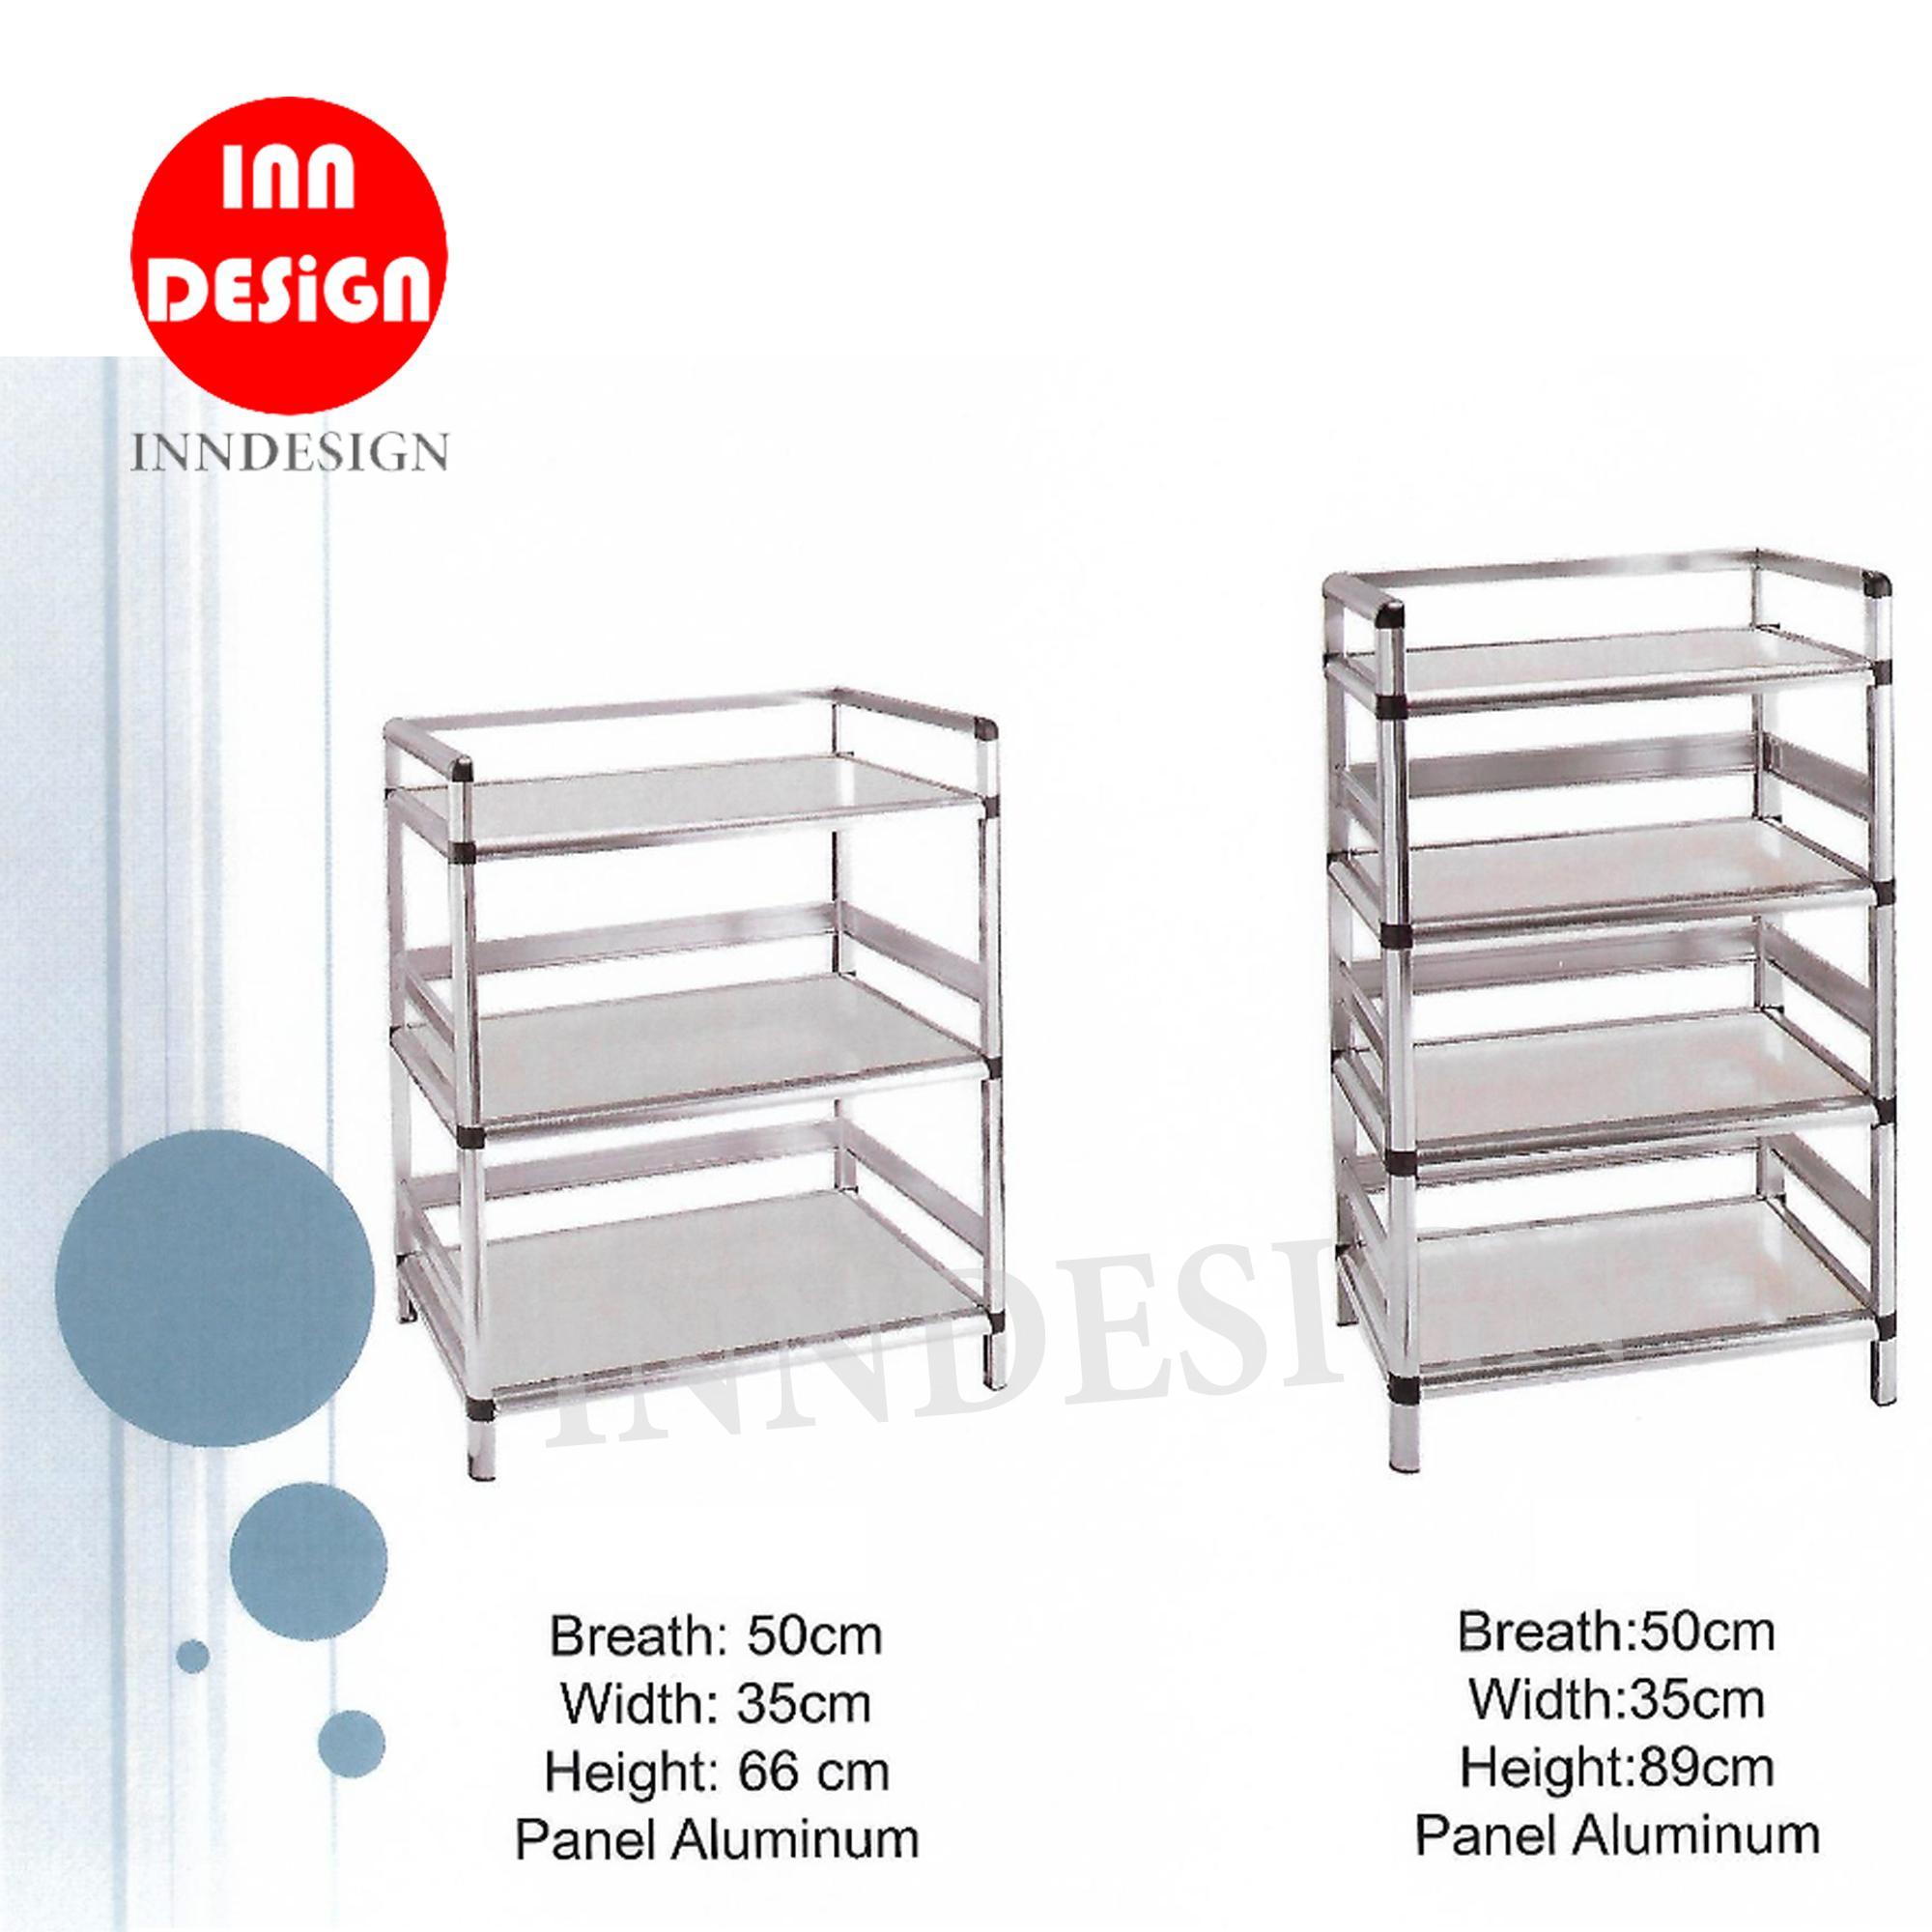 Kitchen Cabinet / Panel Aluminium / Kitchen Organizer (3 / 4 Tiers)